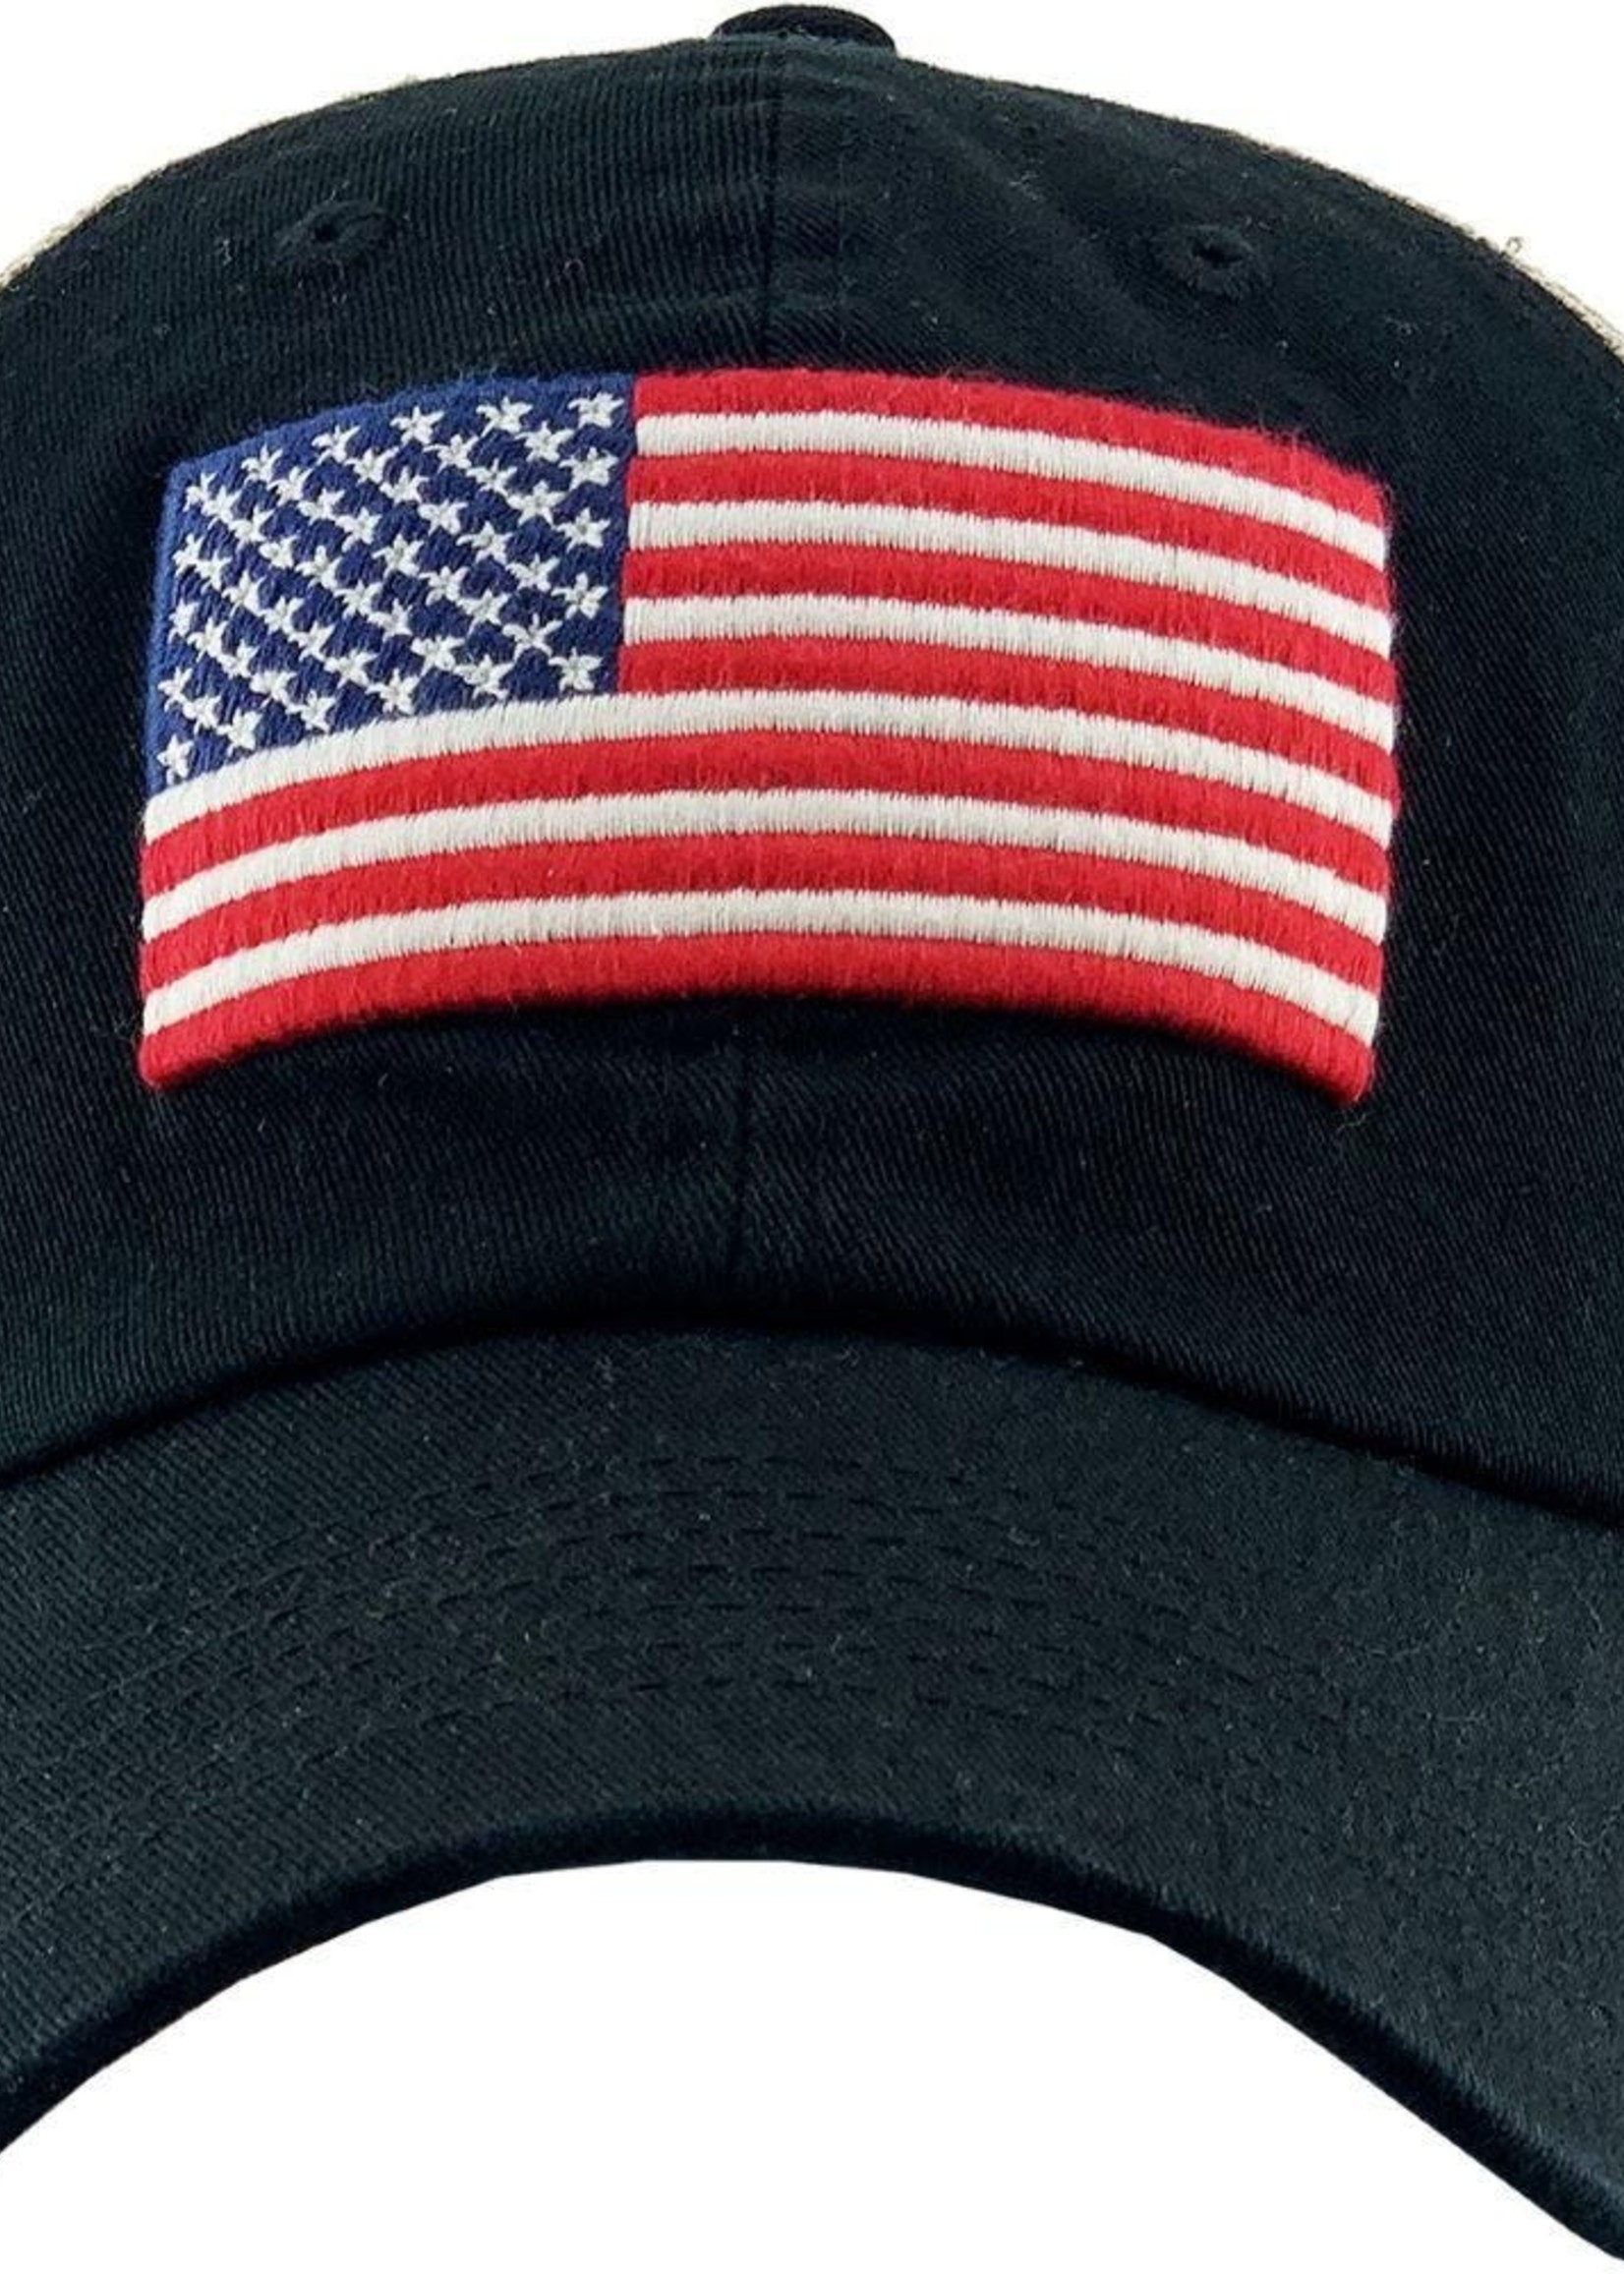 Judson Vintage Distressed USA Flag Mesh Baseball Cap